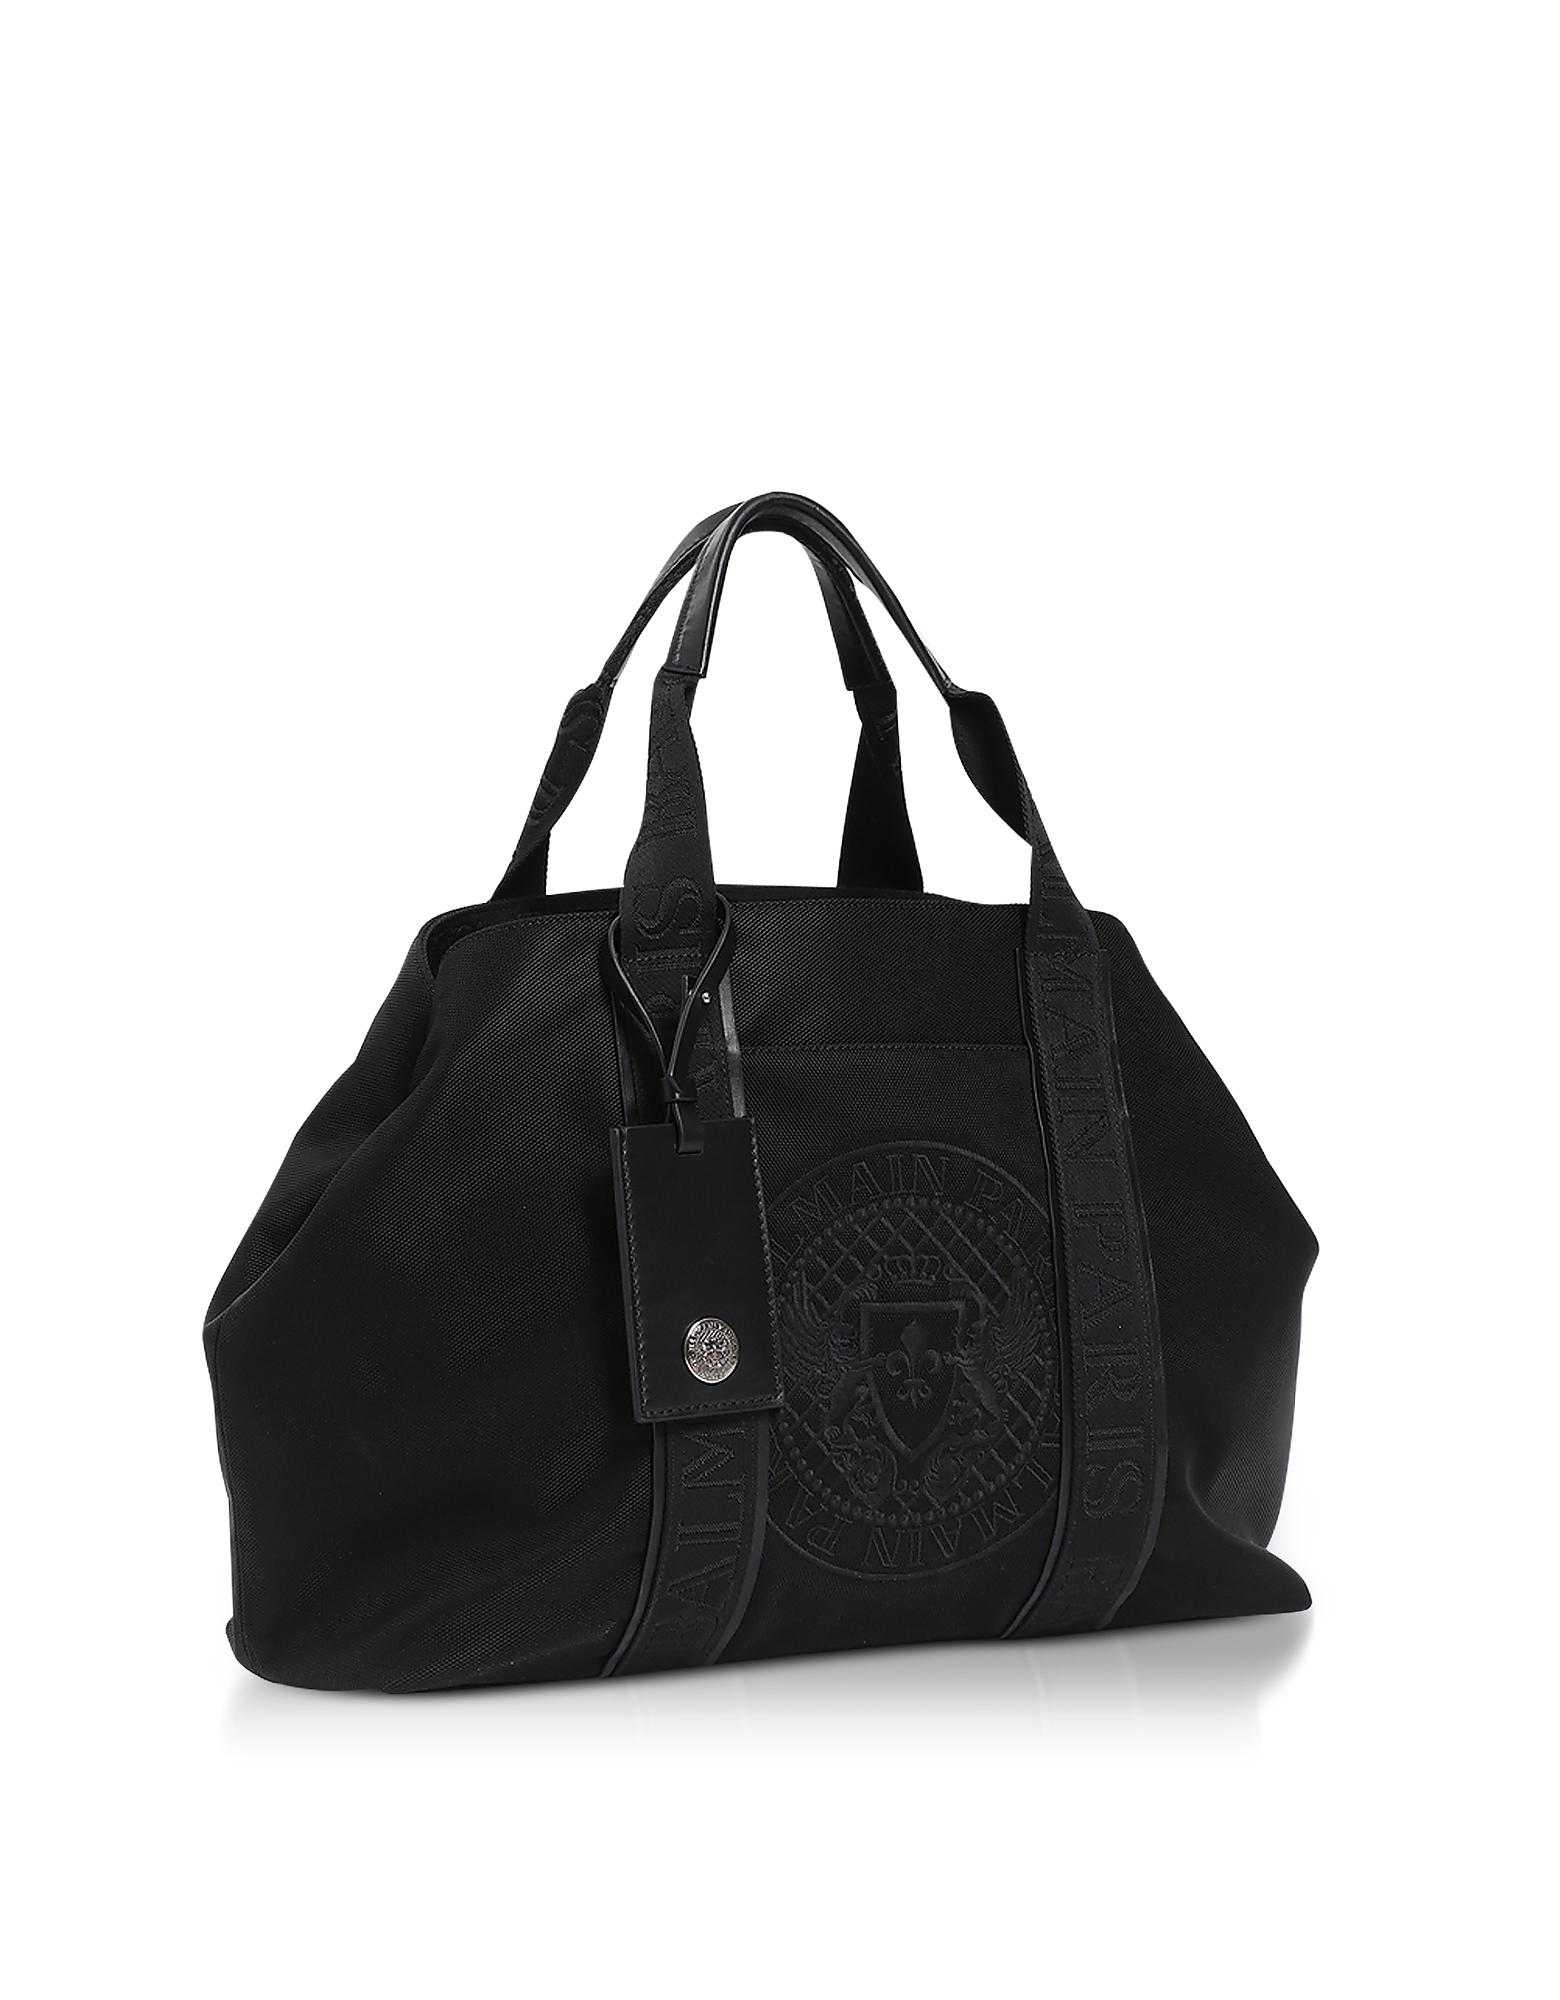 Black Nylon Men's Tote Bag от Forzieri.com INT